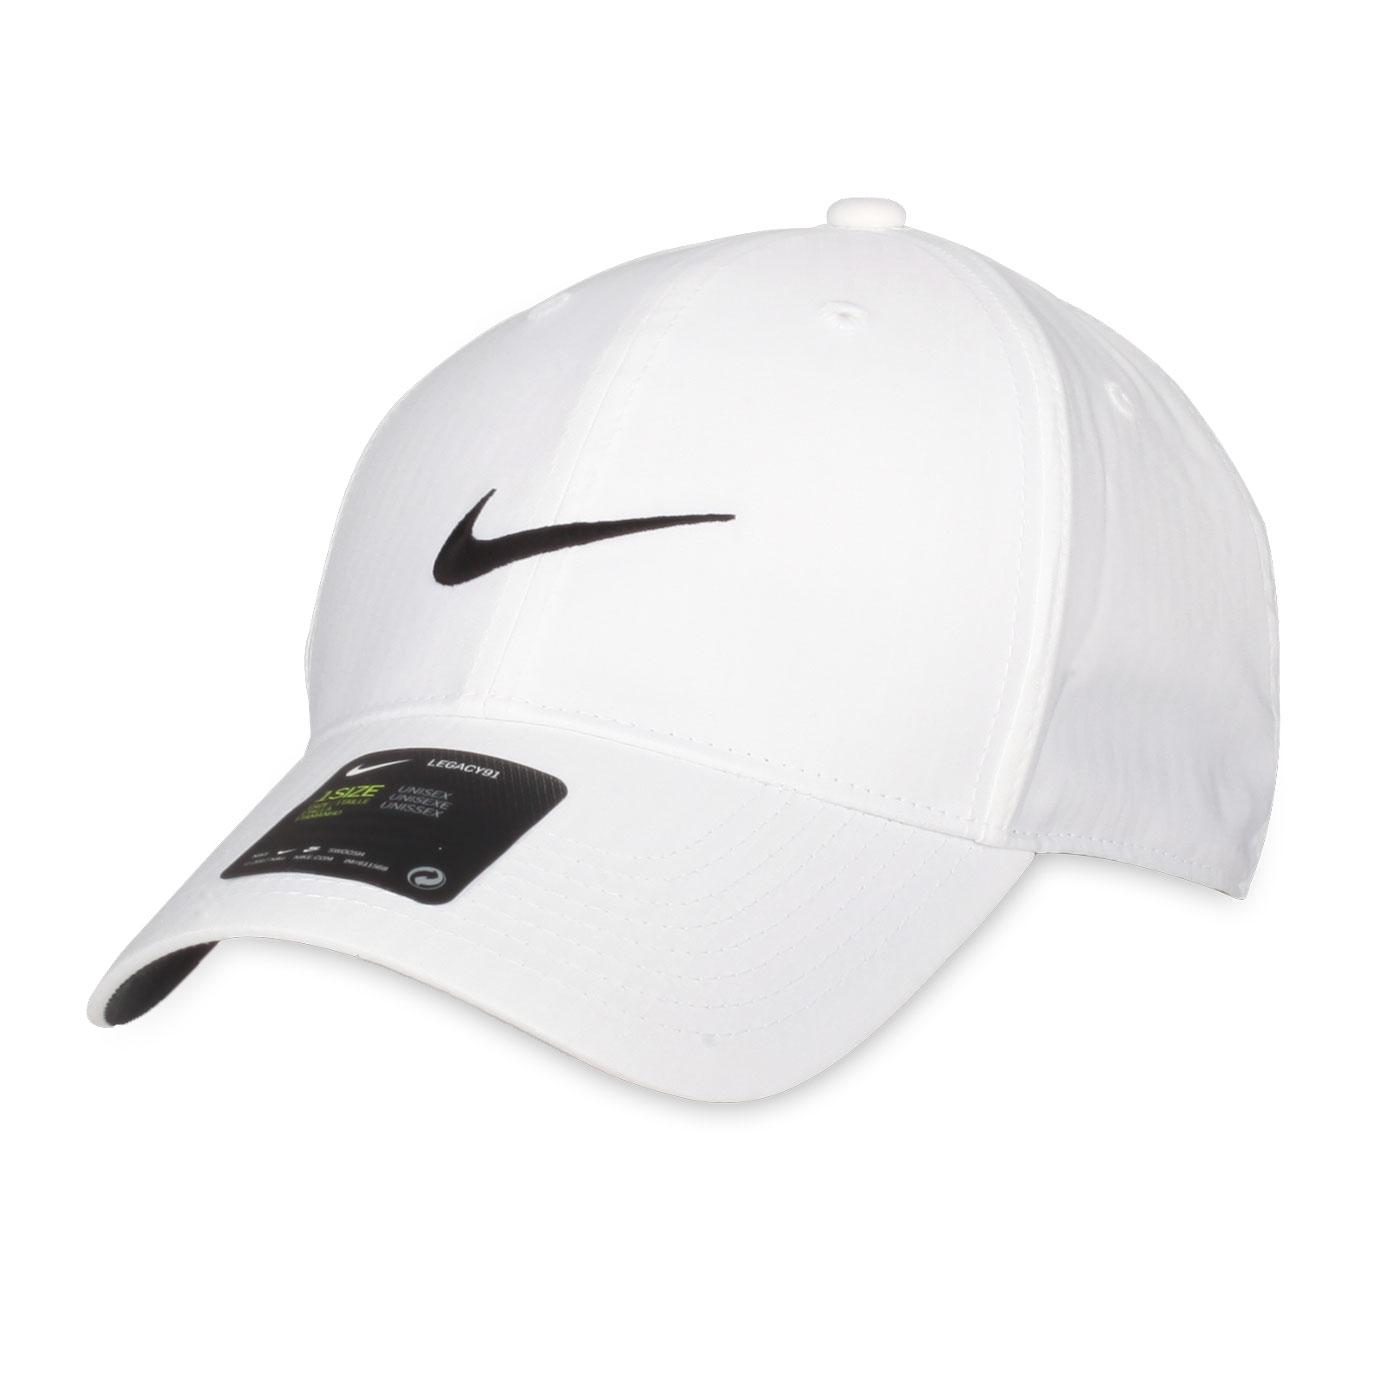 NIKE 高爾夫運動帽  GOLFBV1076-010 - 白黑